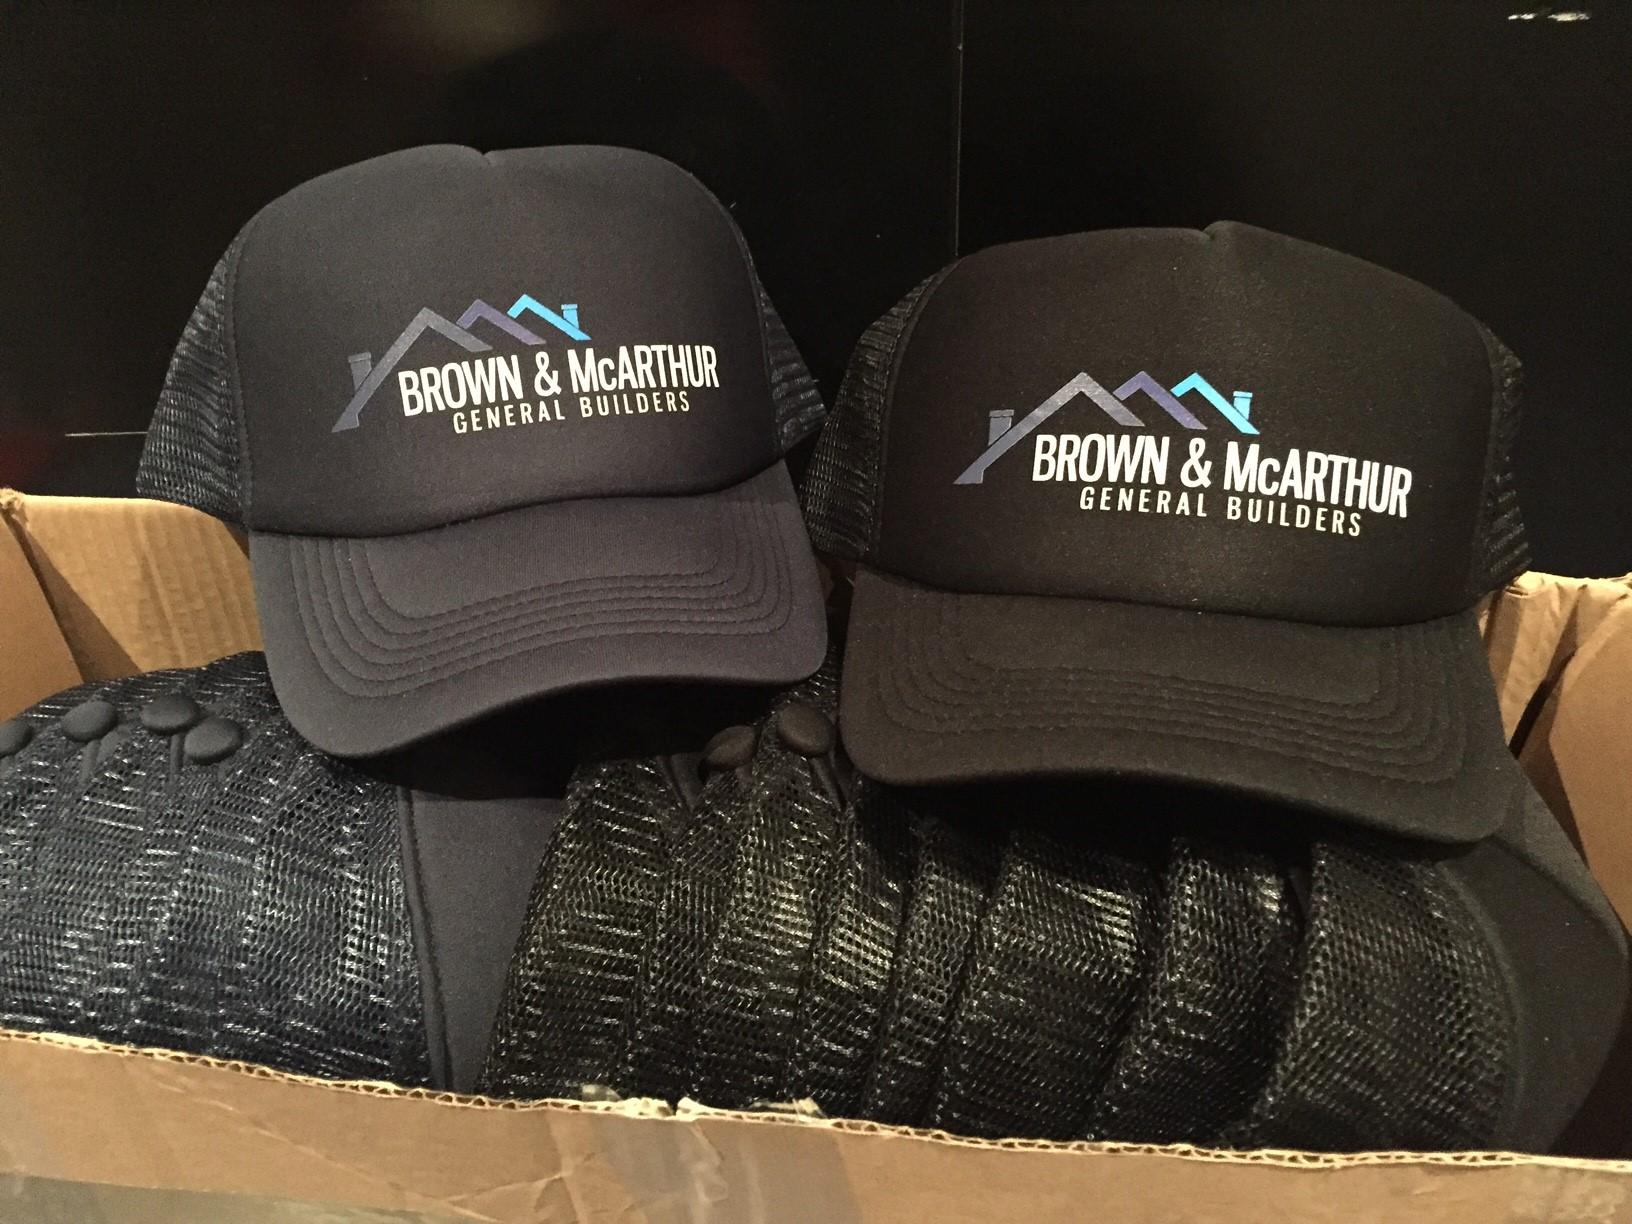 Brown & McArthur Trucker Hats